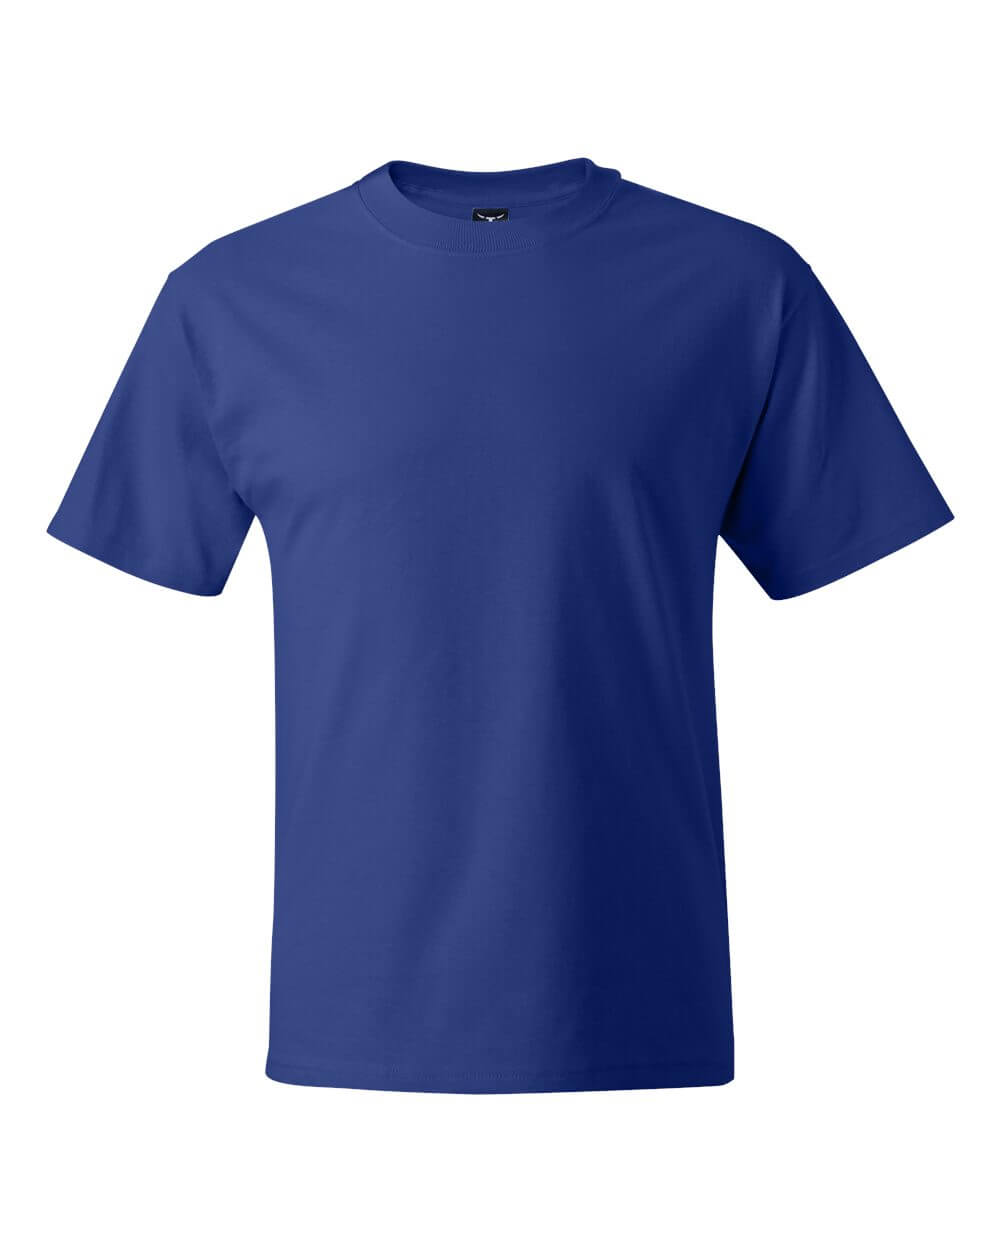 Hanes_5180_Royal Blue Custom T Shirts